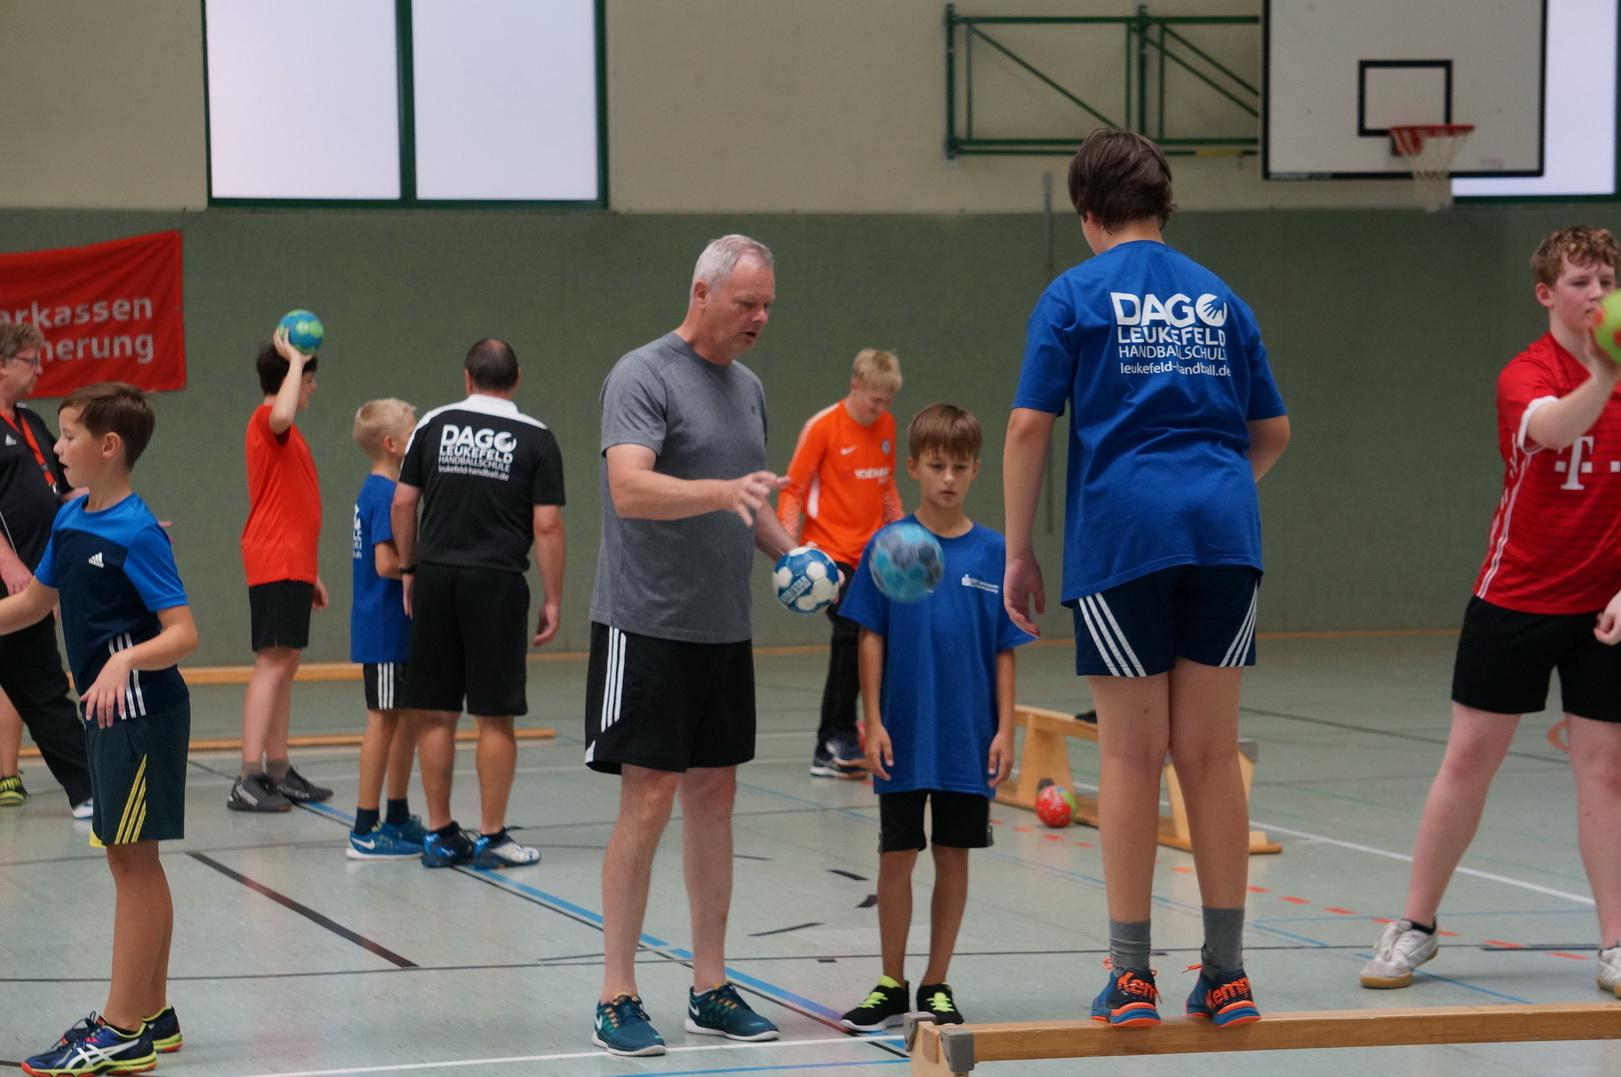 201808_Handballcamp_SDH_MG_173w